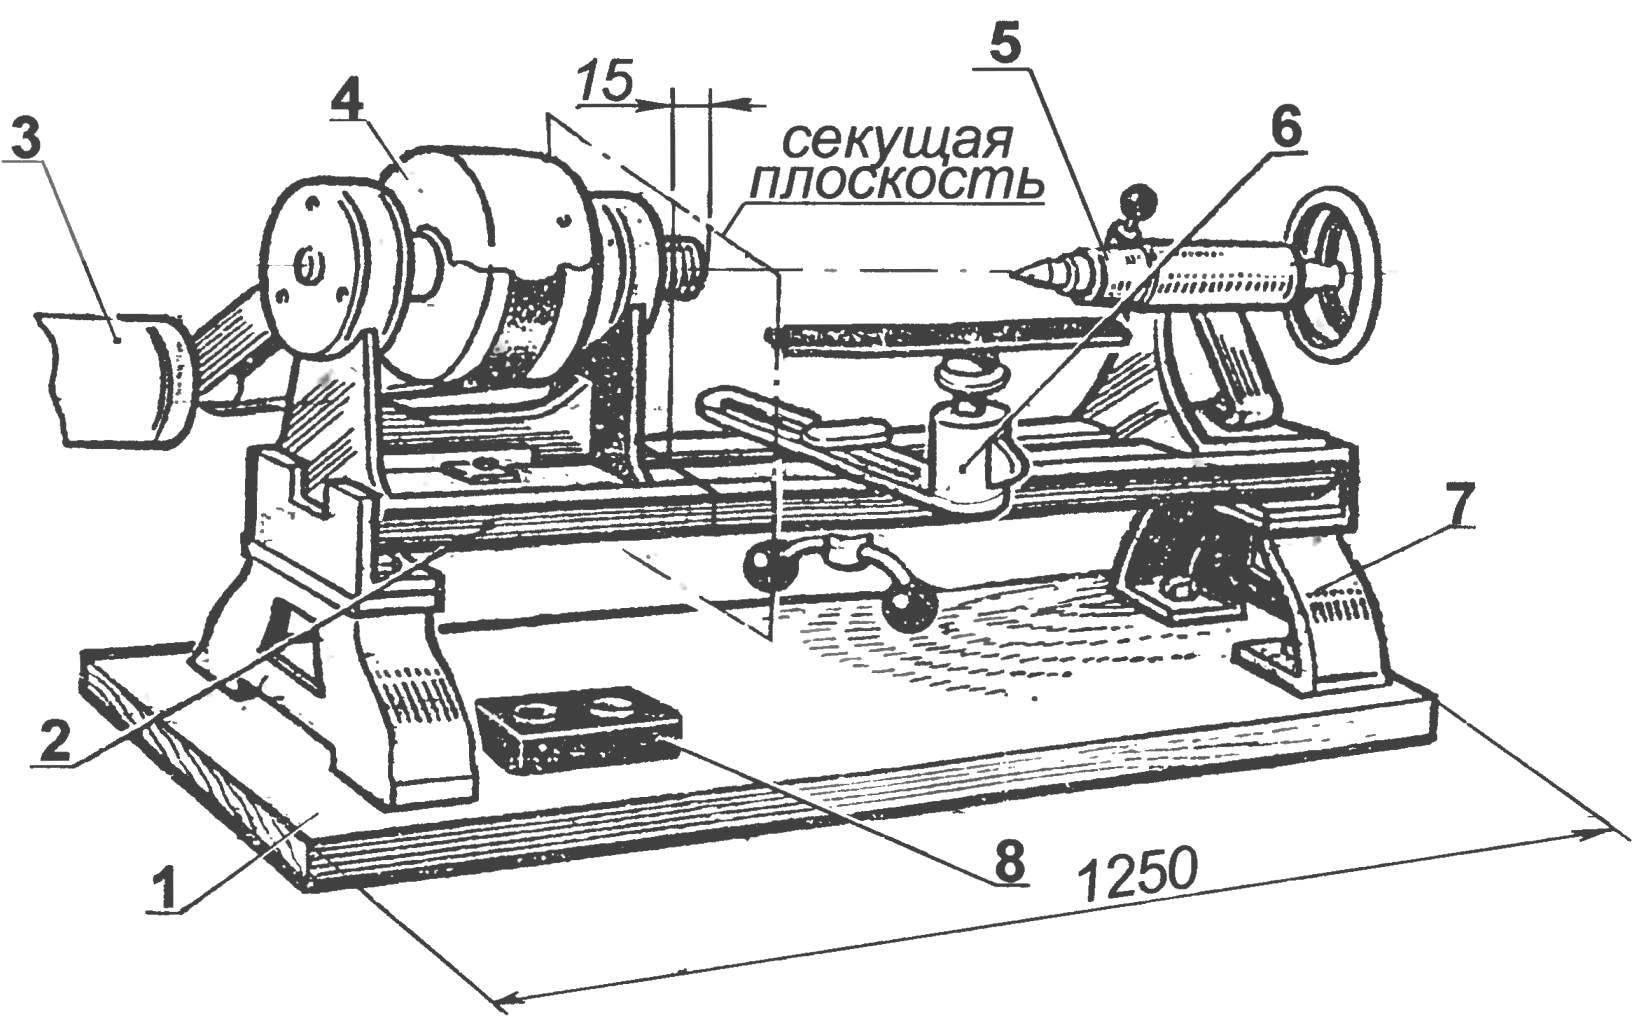 Lathe woodworking machine STD-120